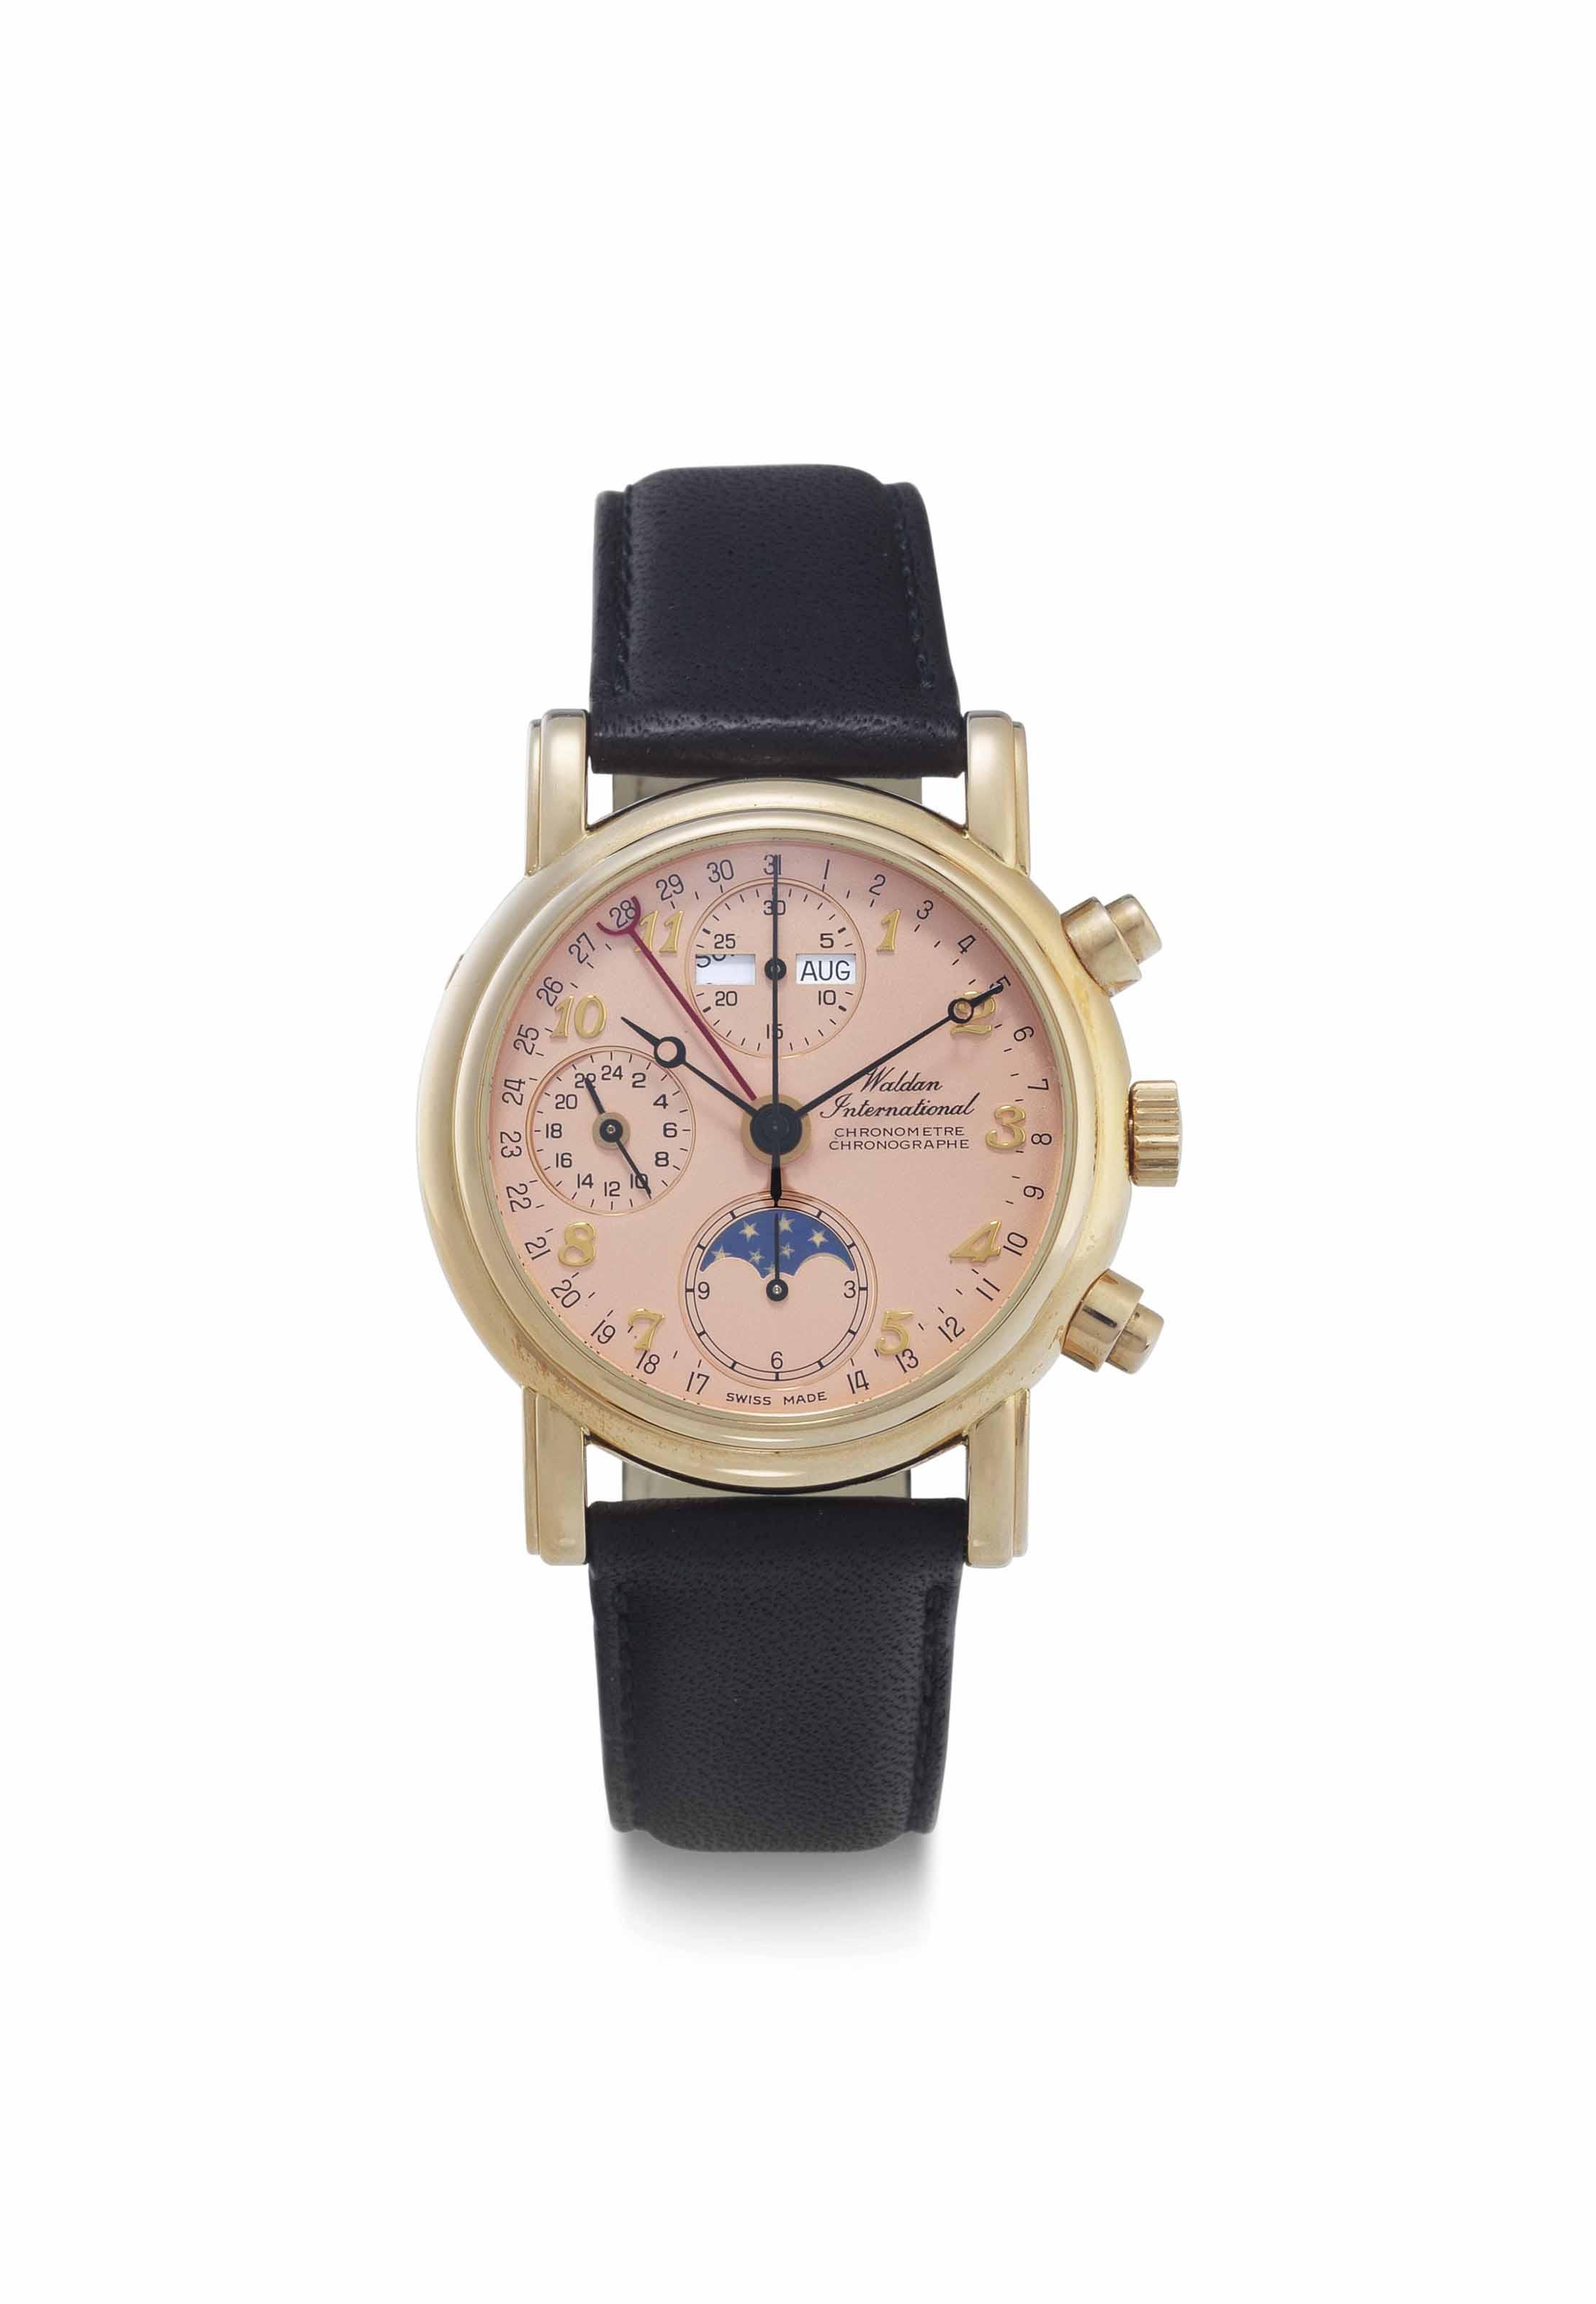 Waldan International. An 18k Pink Gold Automatic Triple Calendar Chronograph Wristwatch with Moon Phases